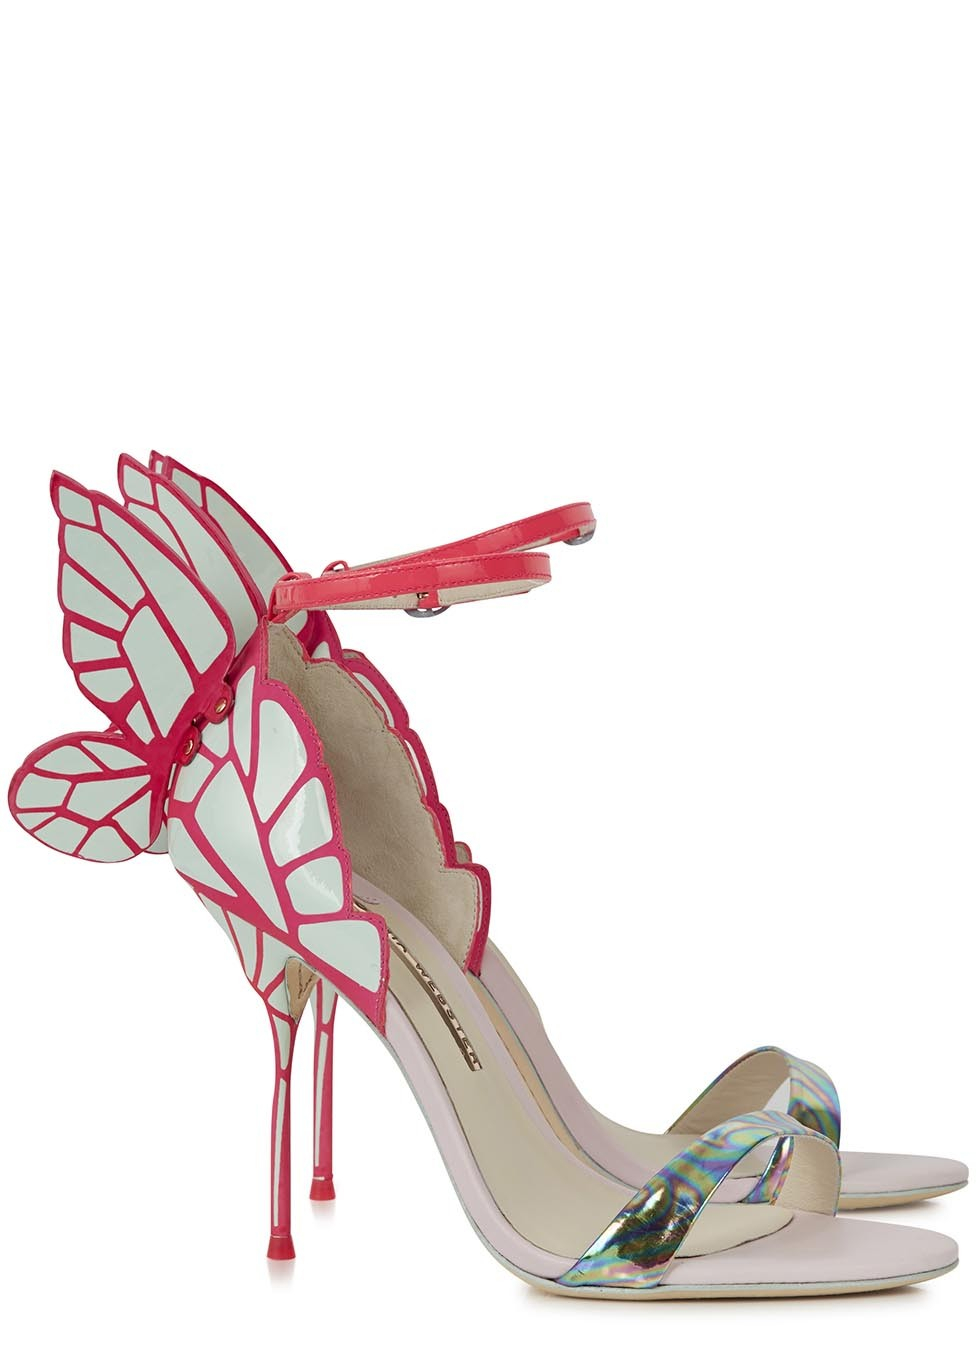 Sophia Webster Chiara Butterfly Leather Sandals In Pink Lyst